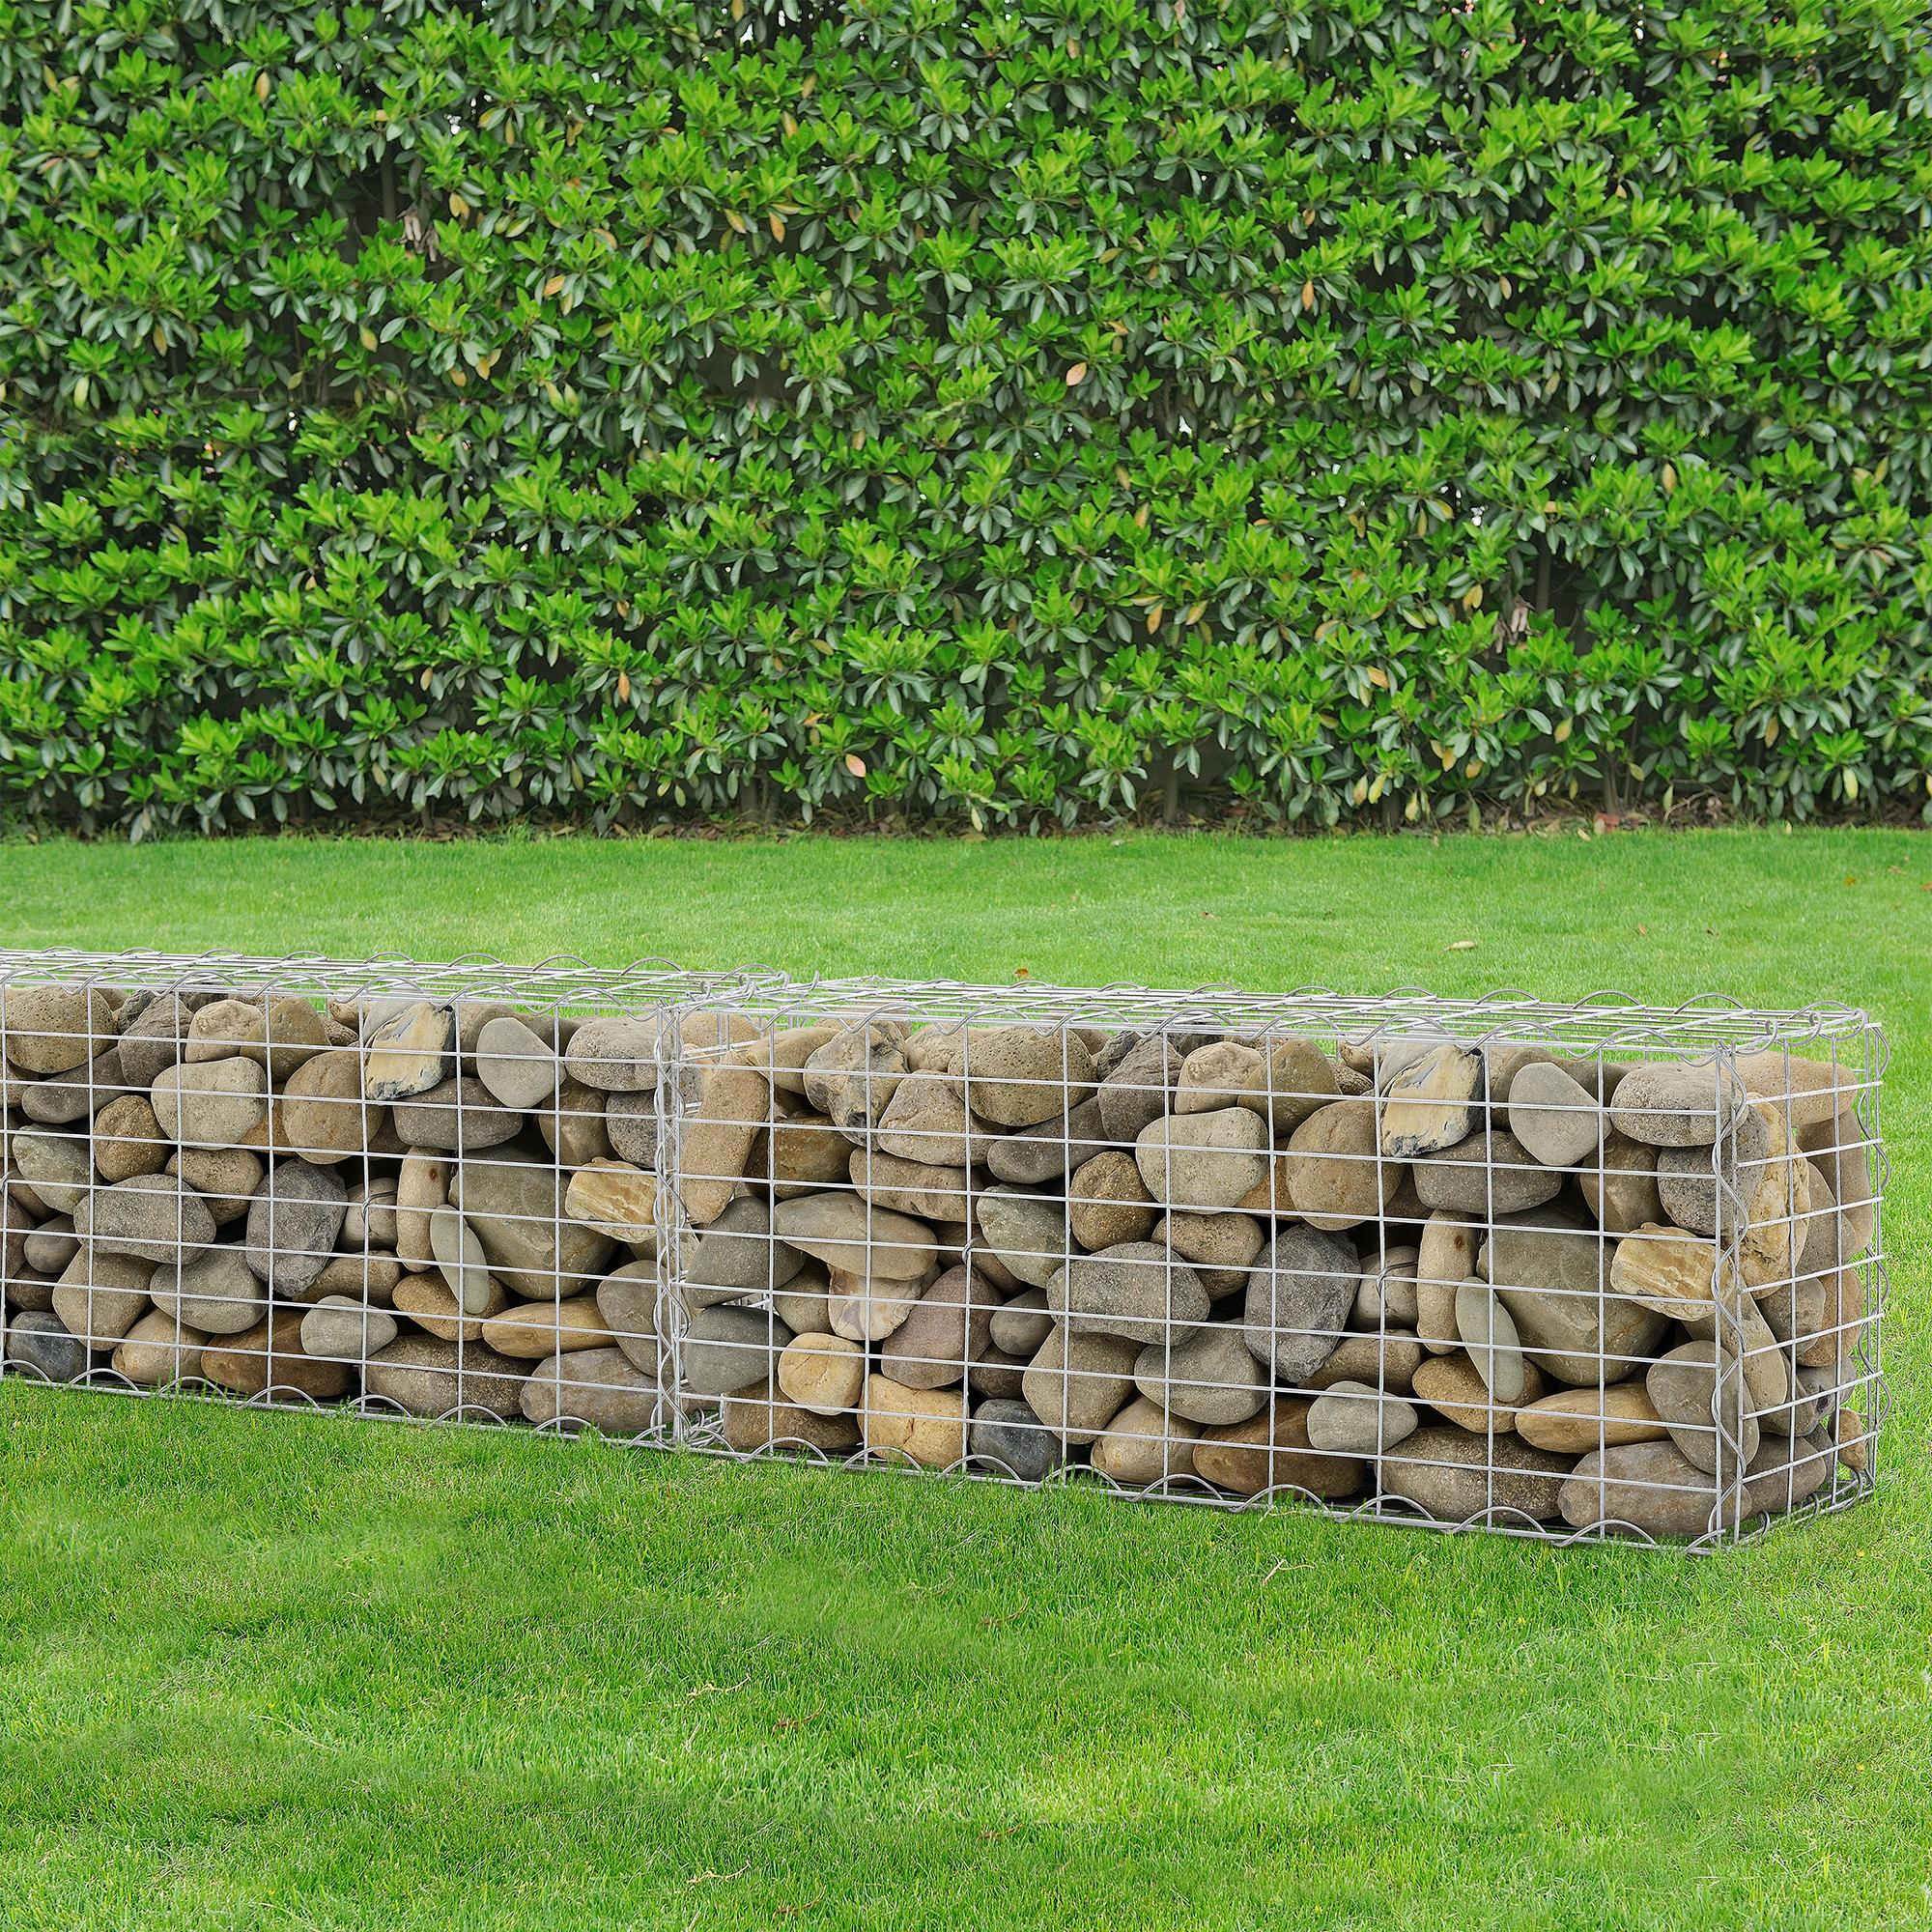 gabion 100x40x30 cm stone basket wall wire basket gabions. Black Bedroom Furniture Sets. Home Design Ideas